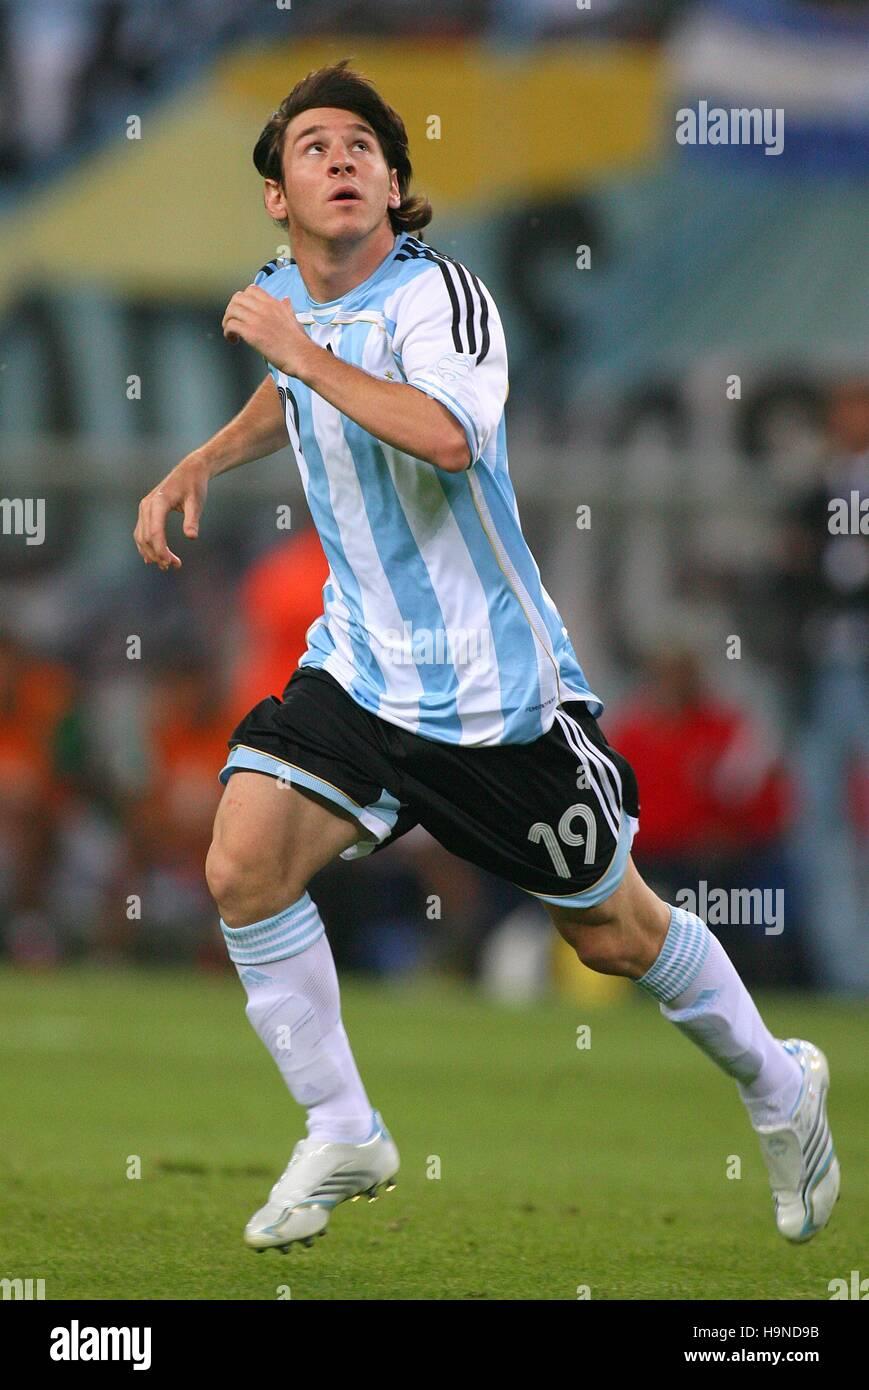 lionel messi argentina barcelona world cup leipzig